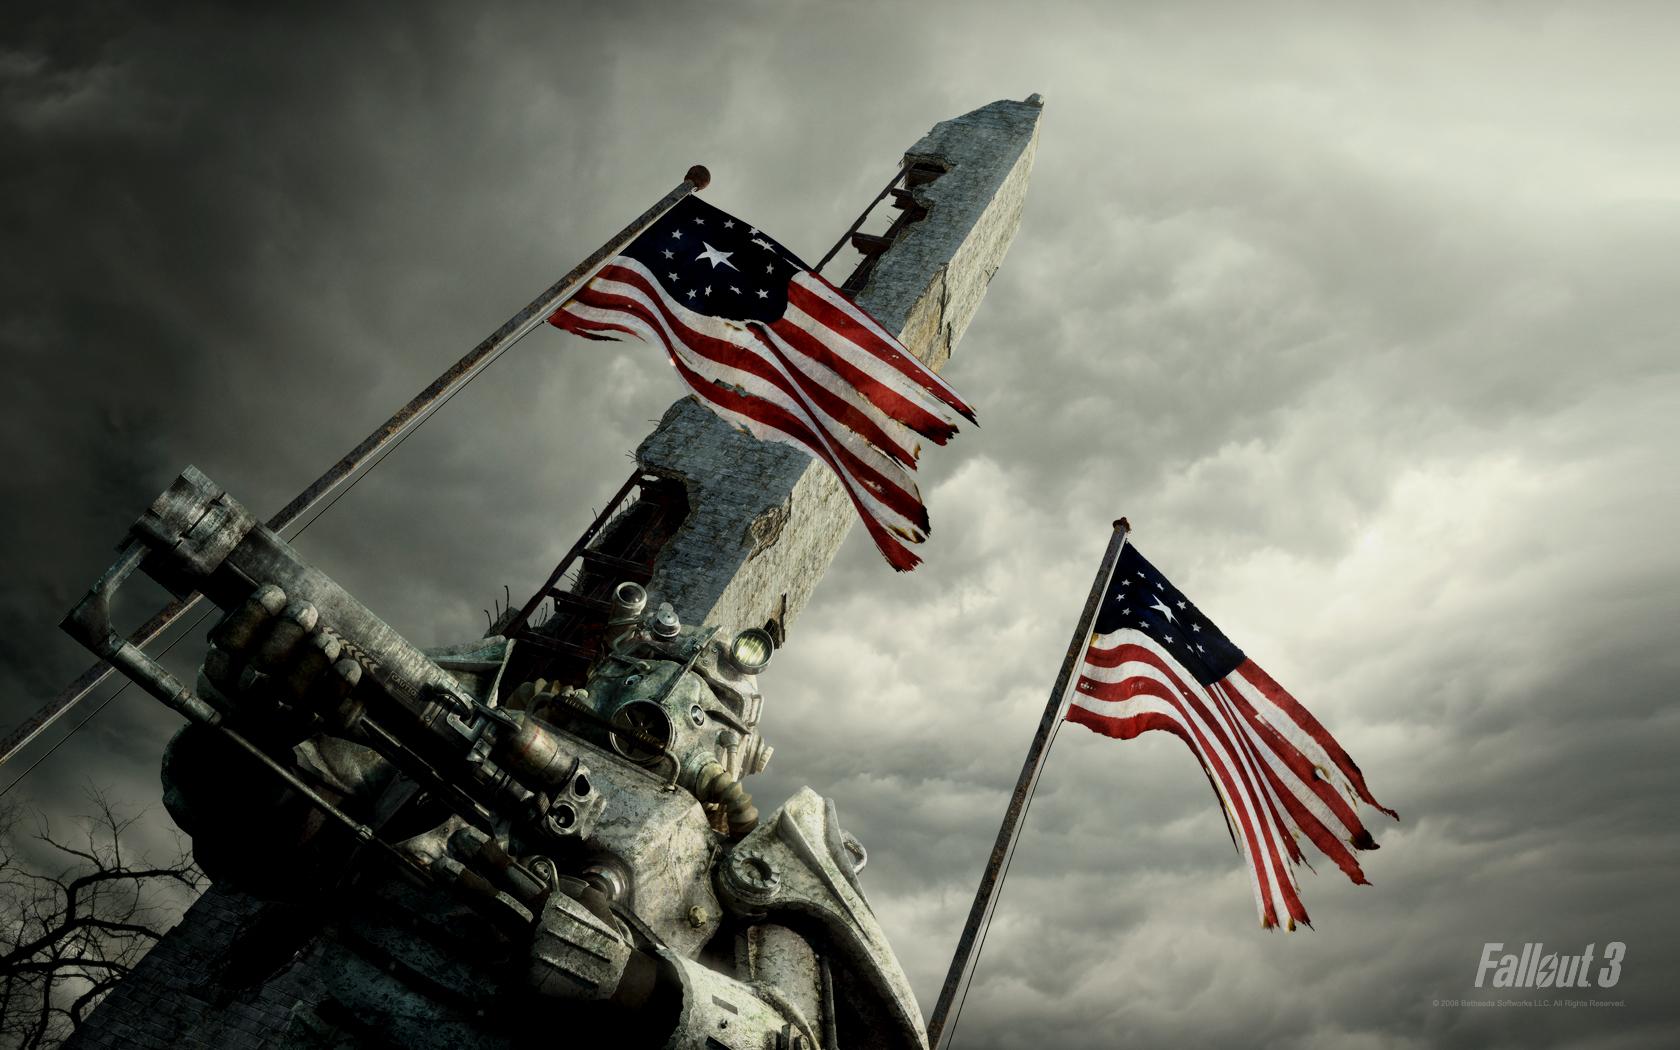 Fallout 3 wallpaper altavistaventures Choice Image